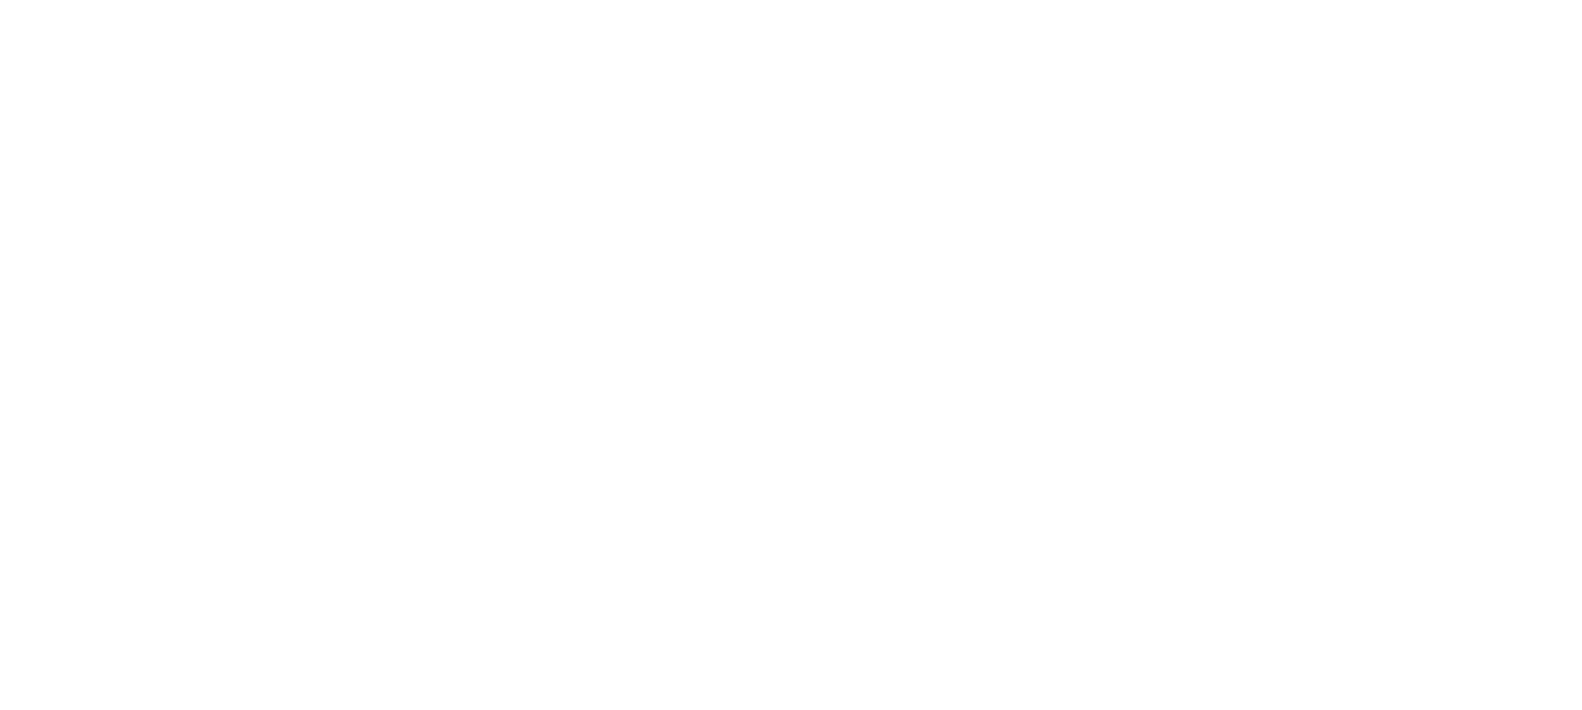 123 Host